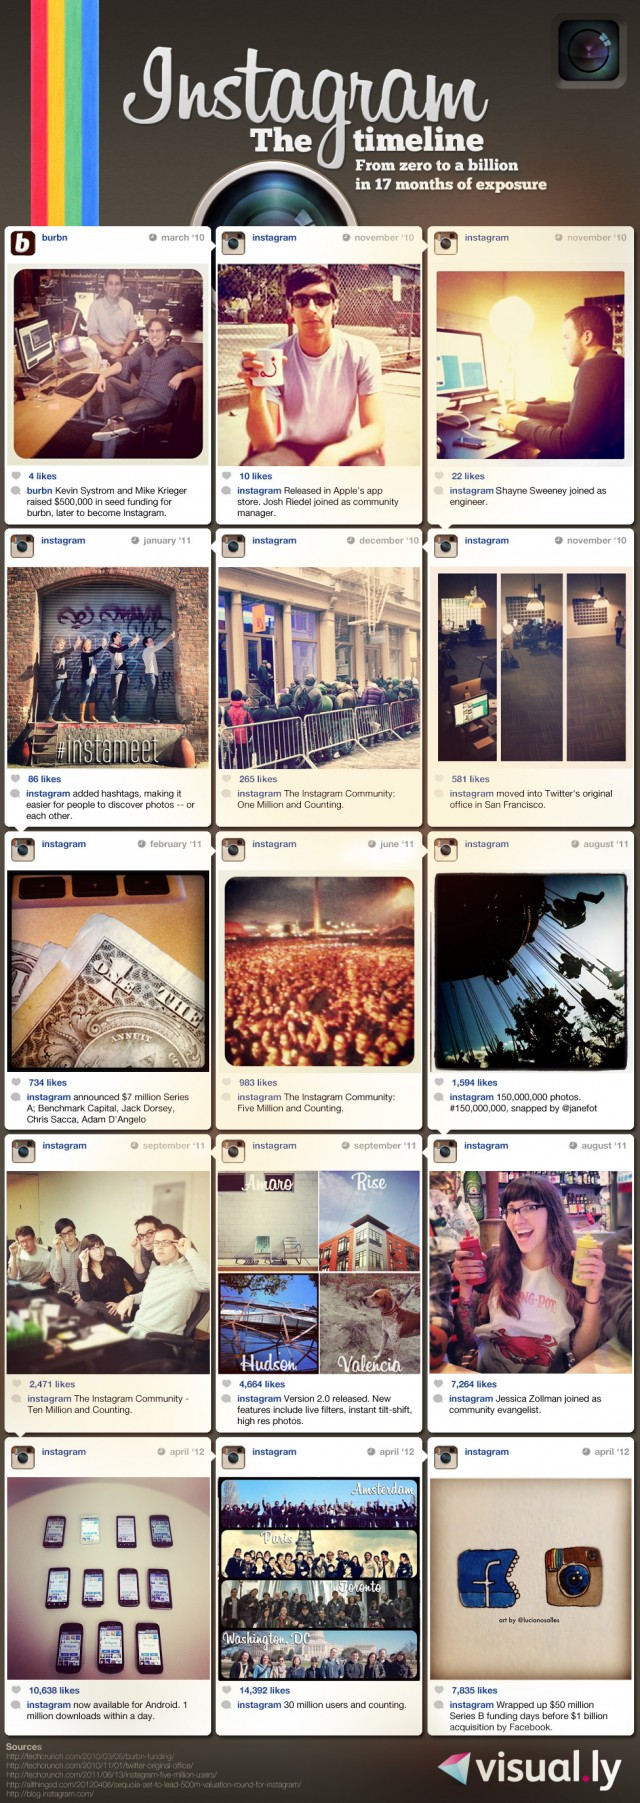 InstagramFromZerotoaBillion_4f84a1f86f668_w6401